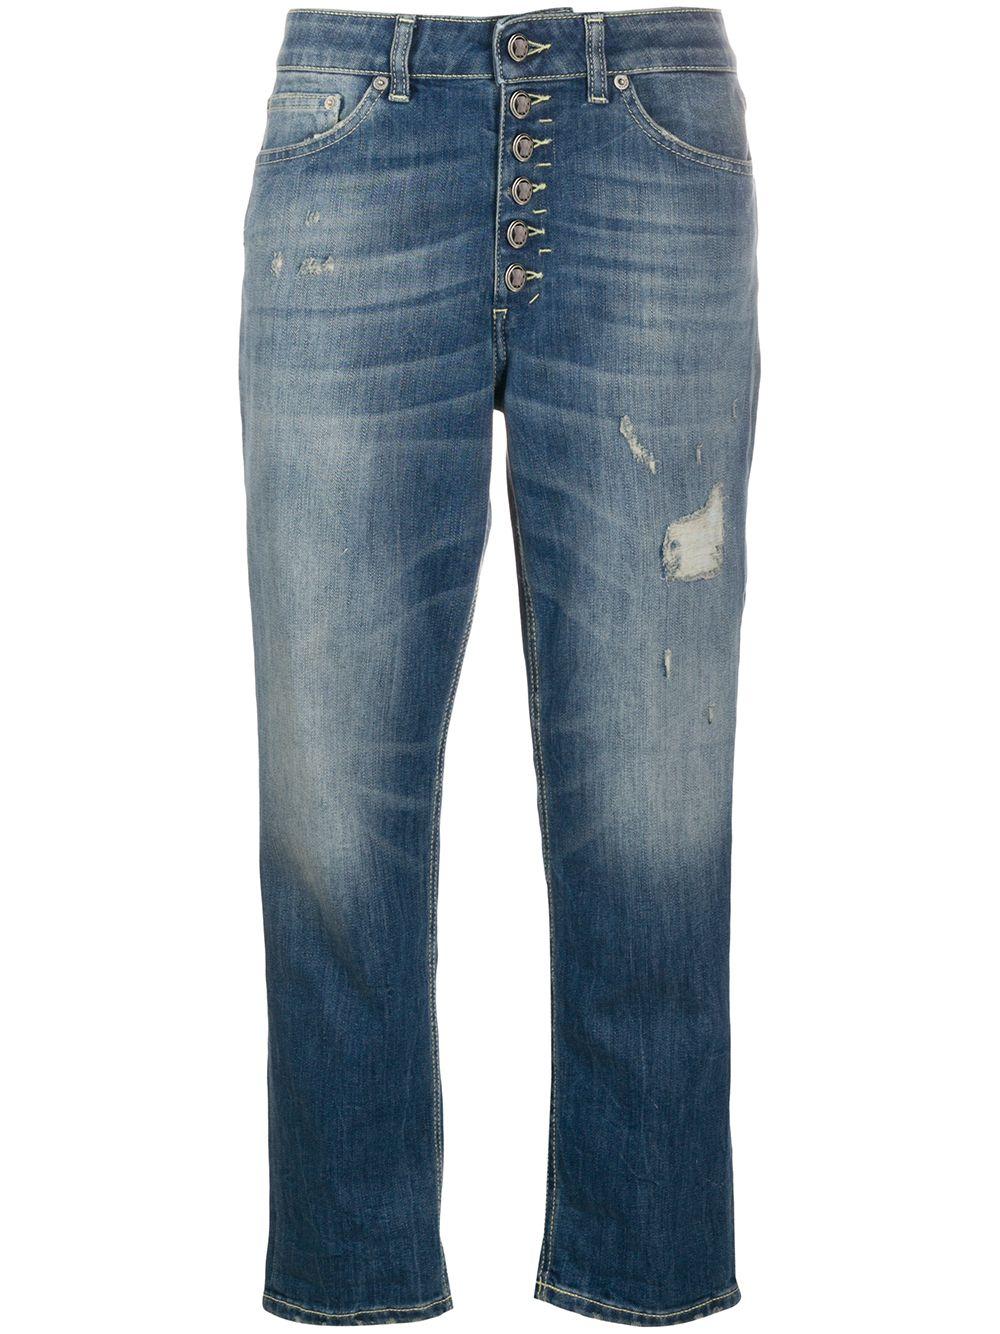 Koons Denim Jeans